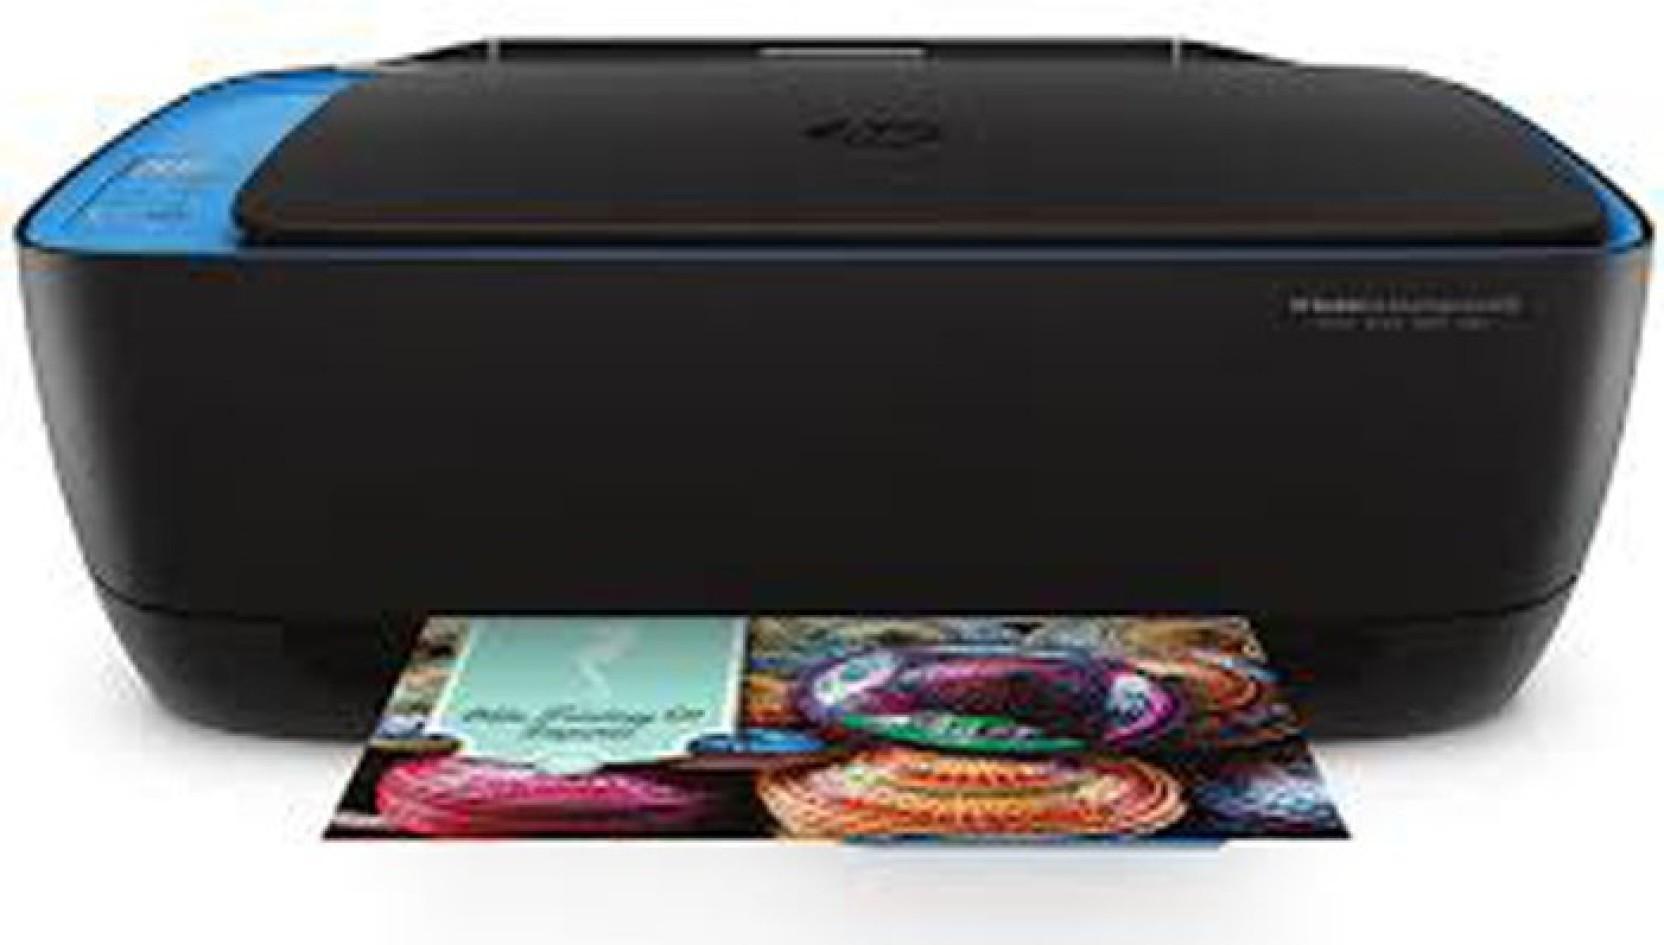 Hp Deskjet Ink Advantage Ultra 4729 Multi Function Wireless Printer 680 Tri Color Original Cartridge Add To Cart